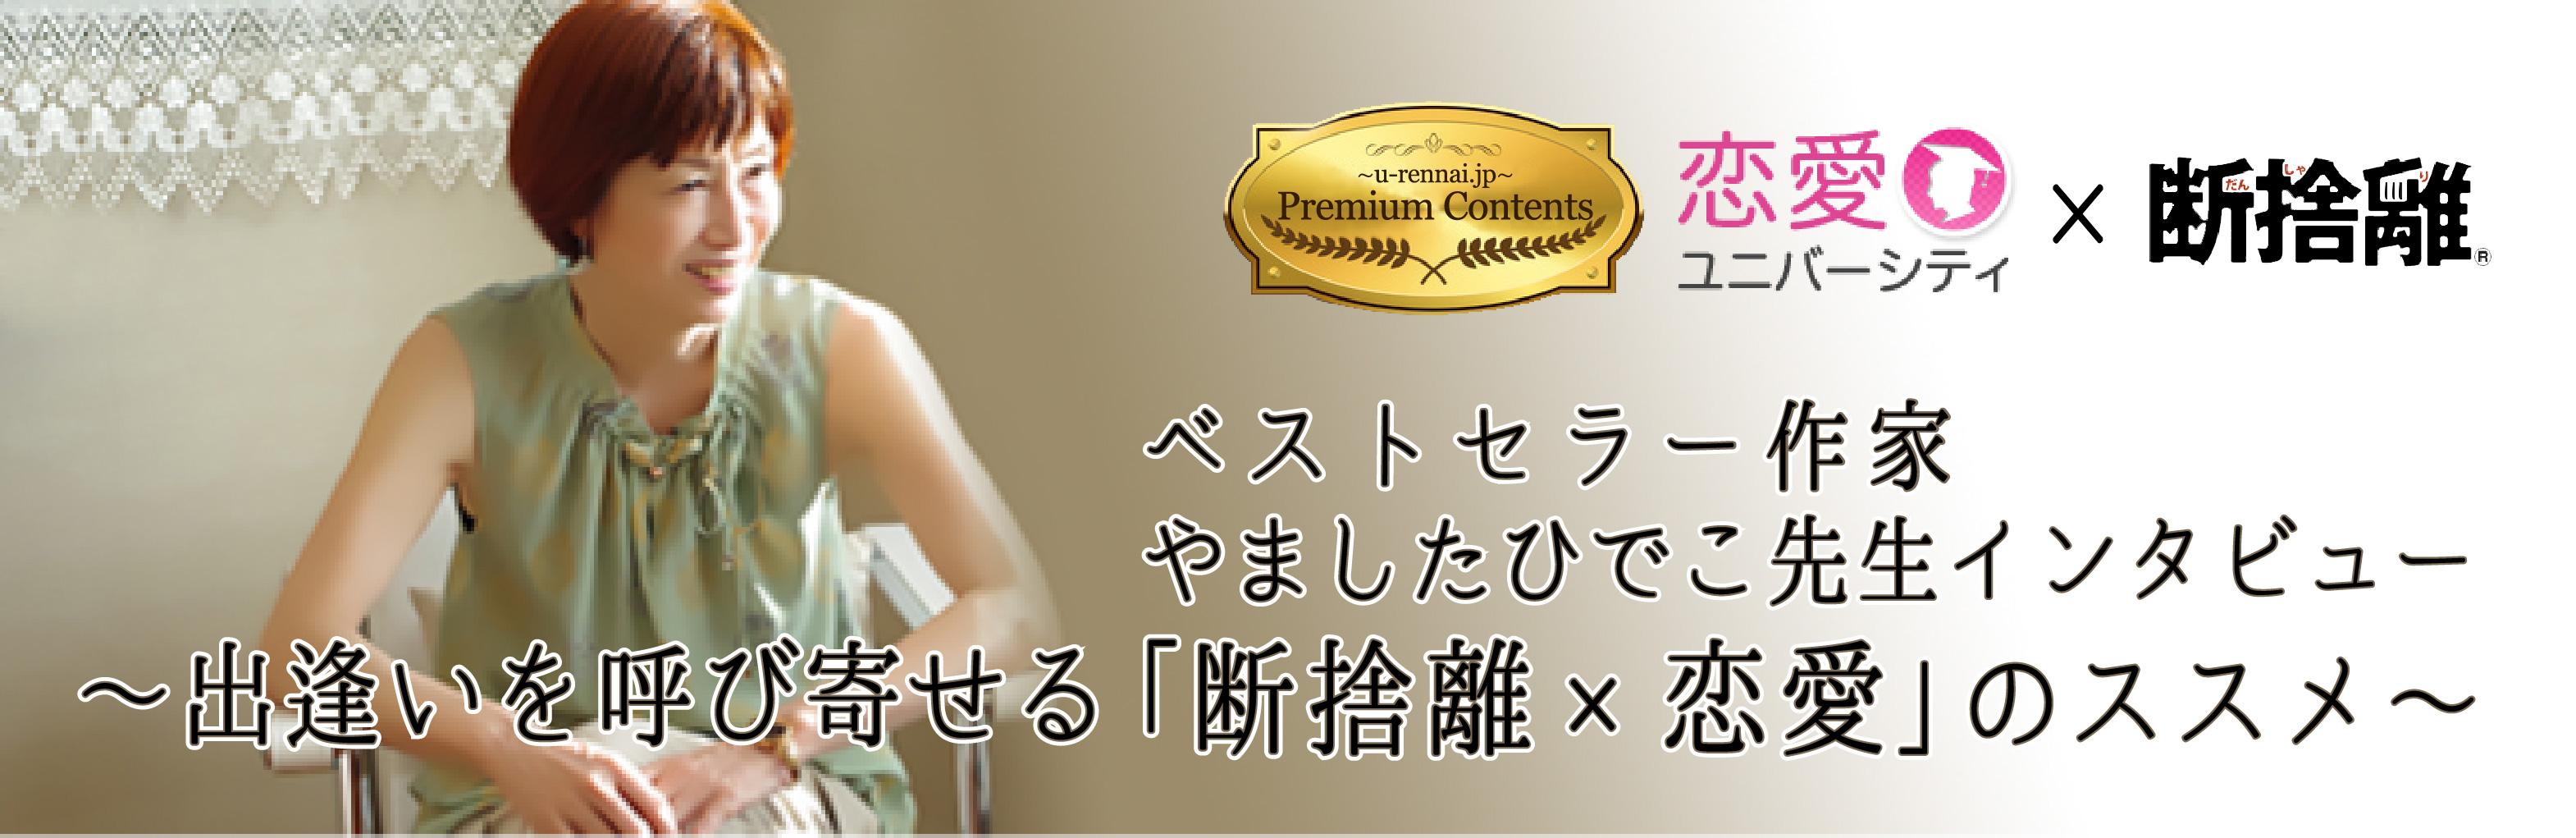 Premium Contents『断捨離x恋愛』やましたひでこ先生インタビュー